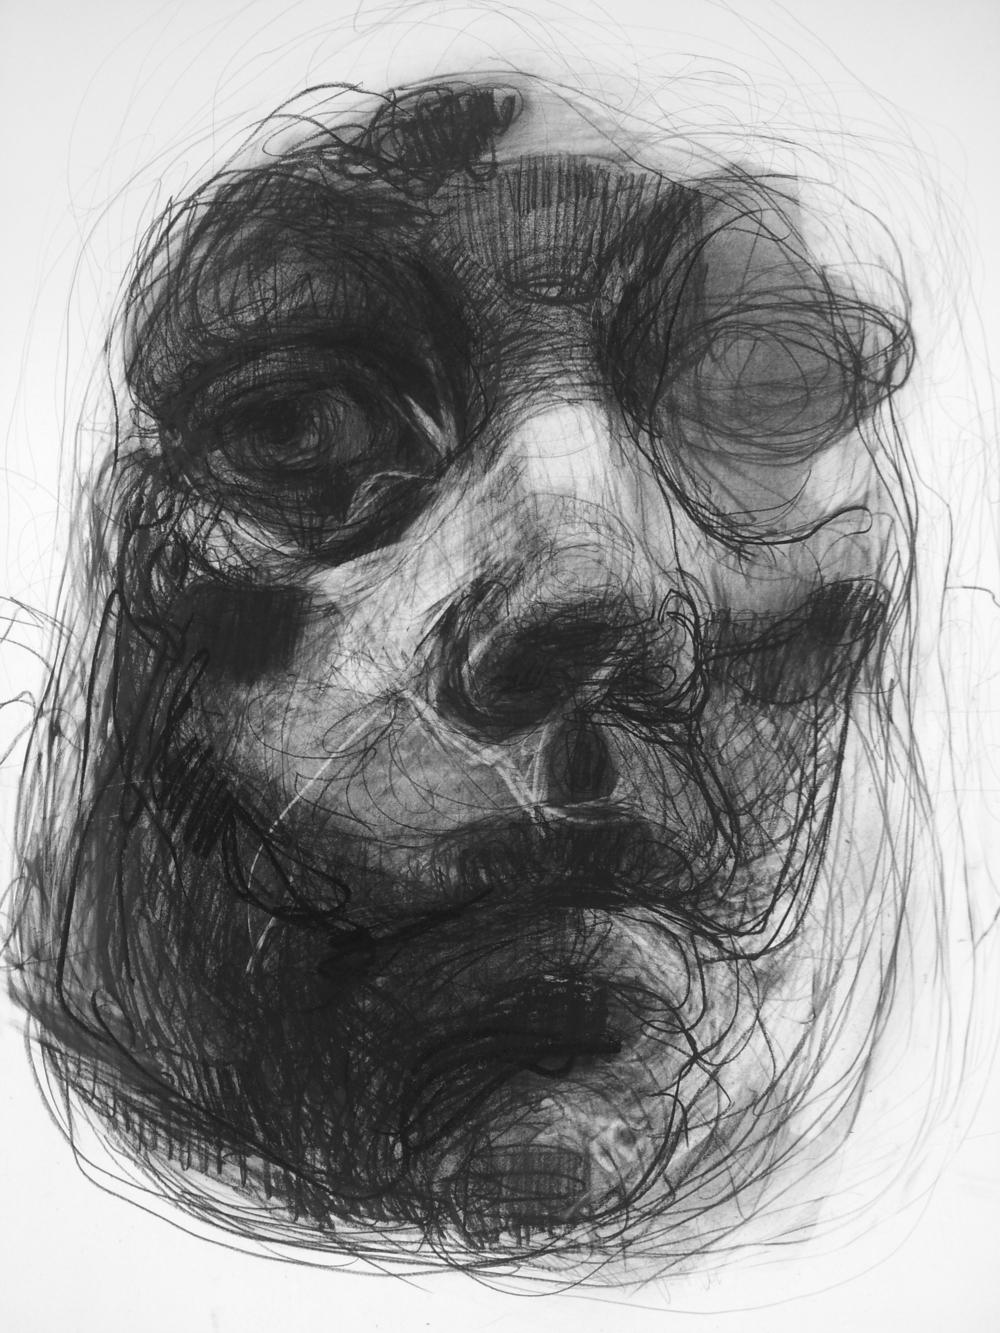 Mask no. 10